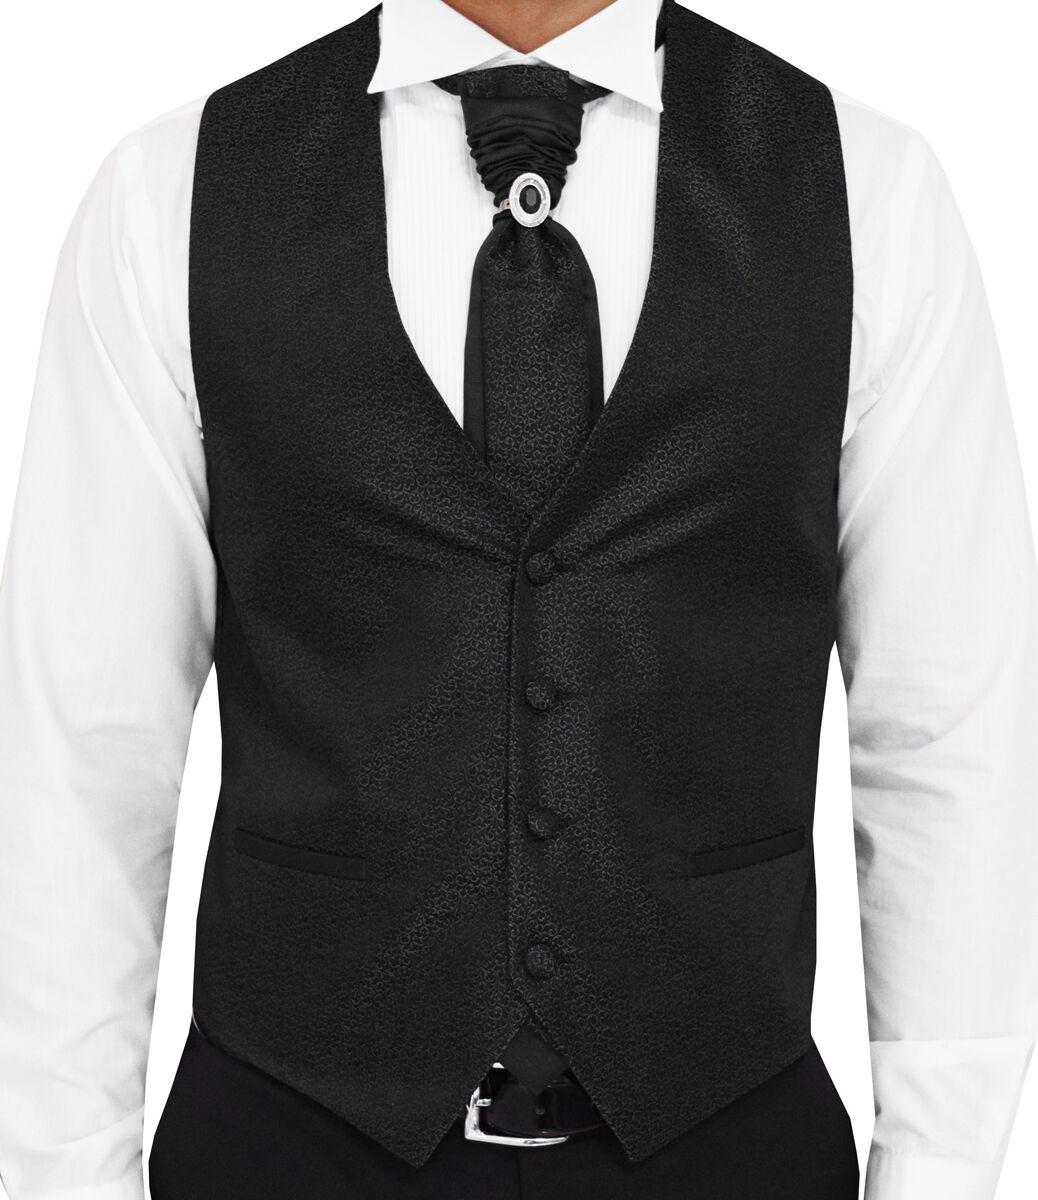 Nuziale da uomo nera Gilet Flora - pezzi-Designer 3 pezzi-Designer - Gilet-Taglia s-7xl w16 9a4db6